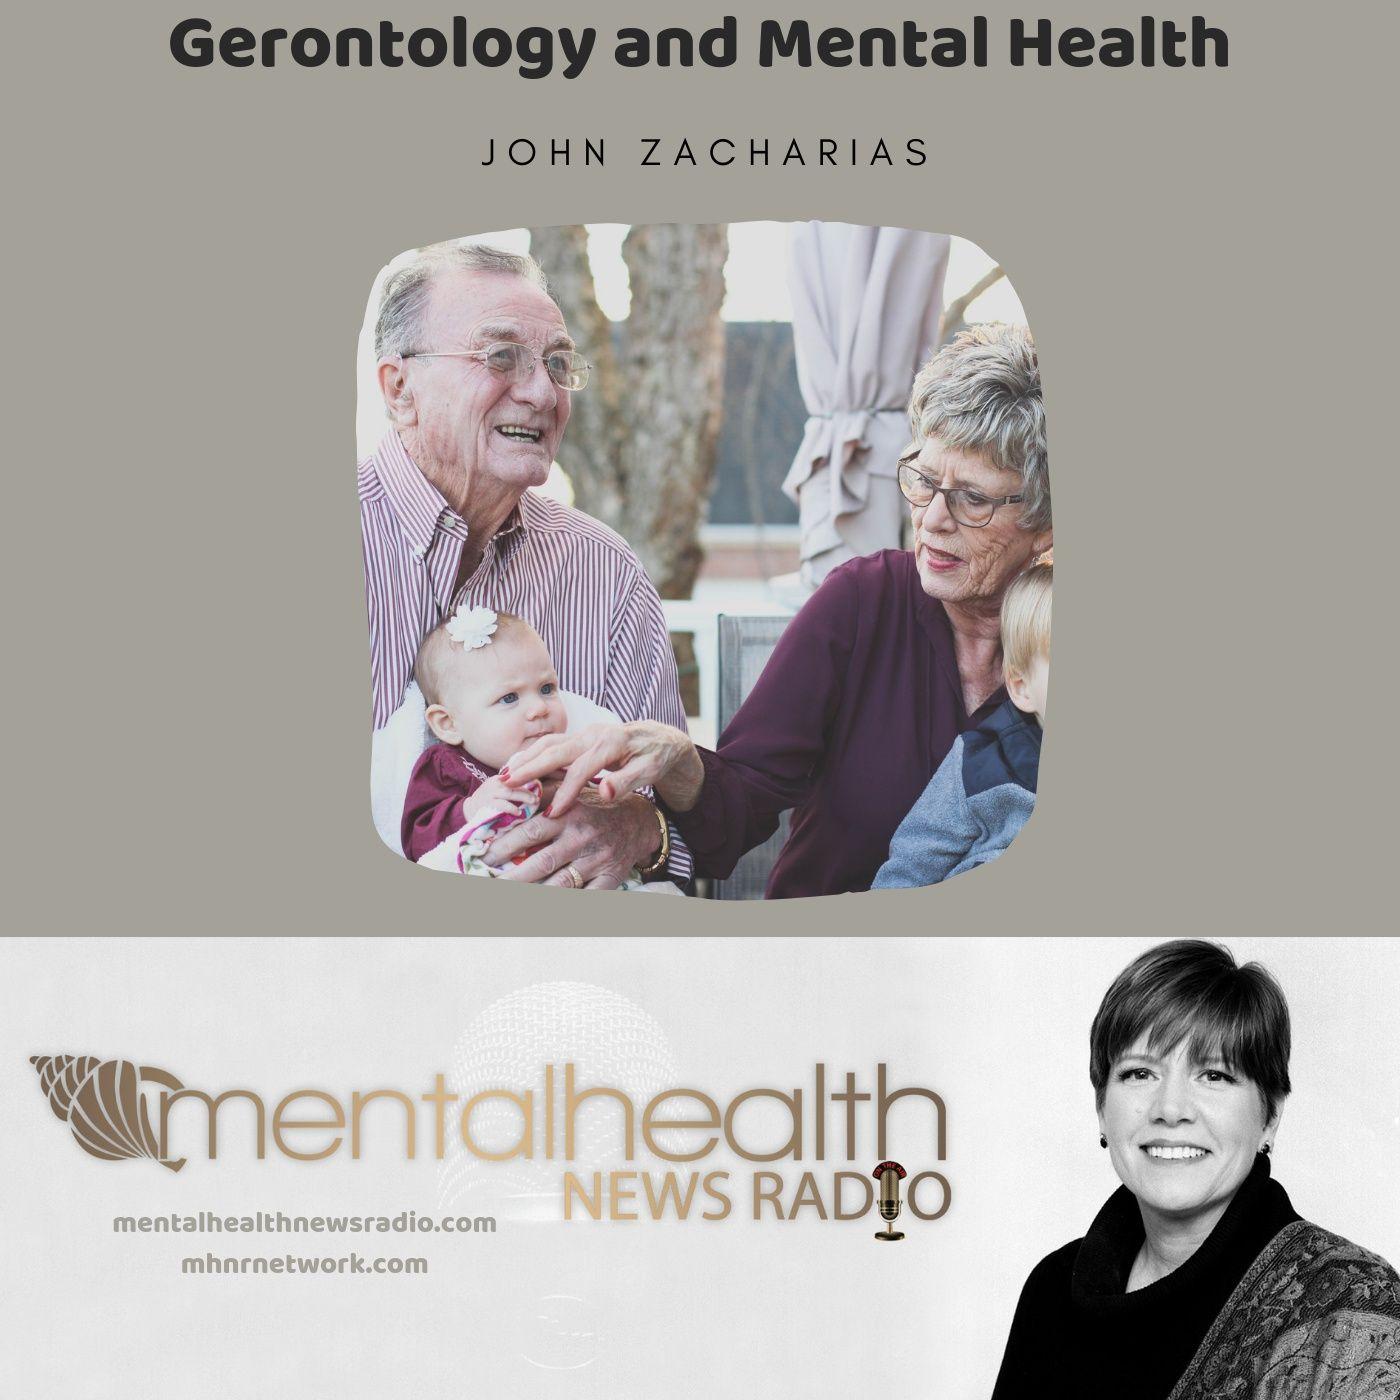 Mental Health News Radio - Gerontology and Mental Health